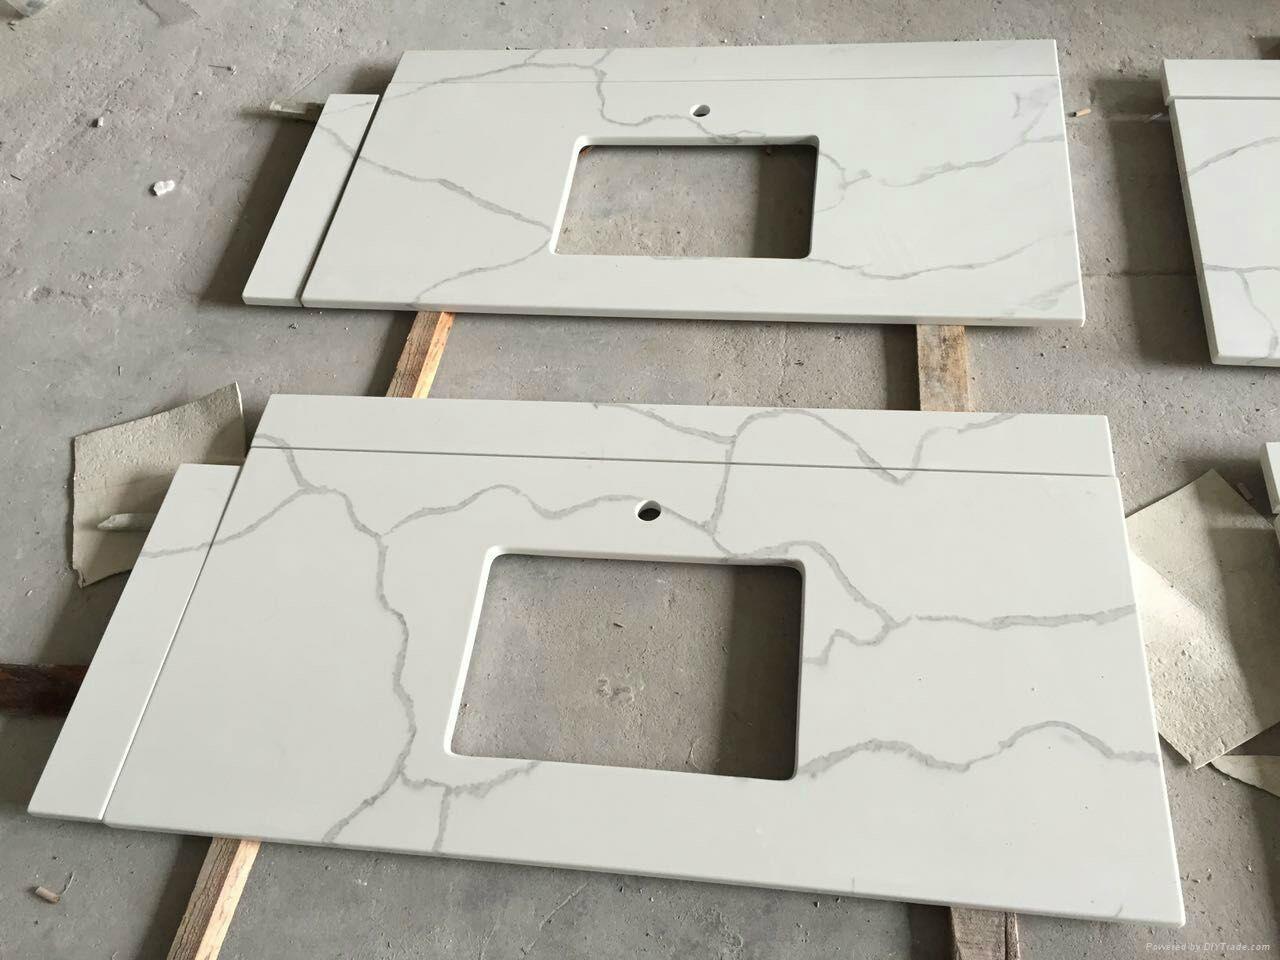 Carrara White Marble Like Quartz Countertops 2